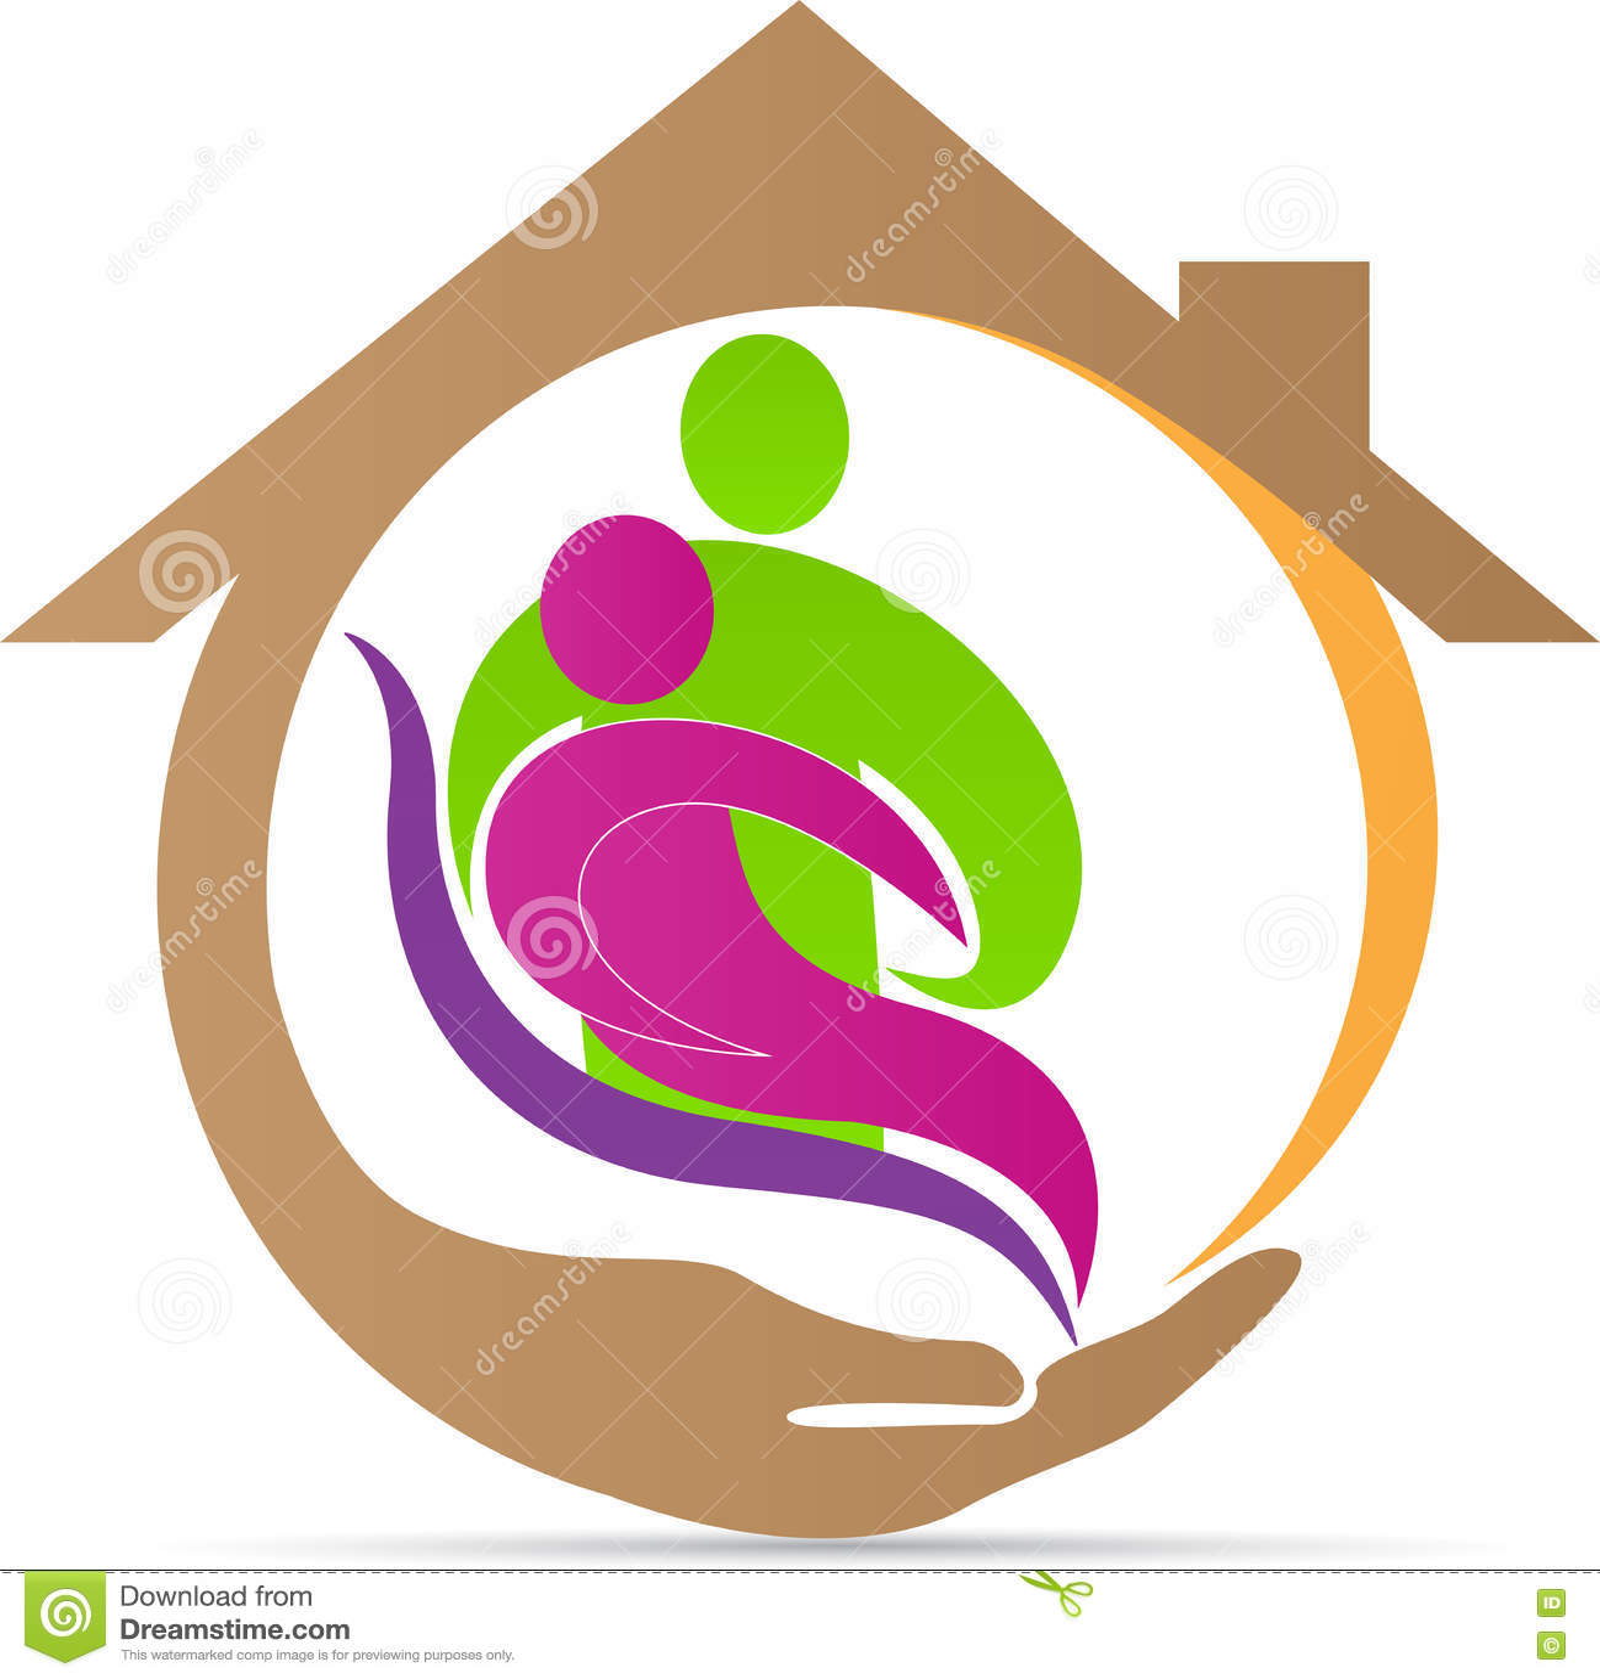 Senior Care Logo Stock Vector - Image: 75699817 Nursing Symbol Design